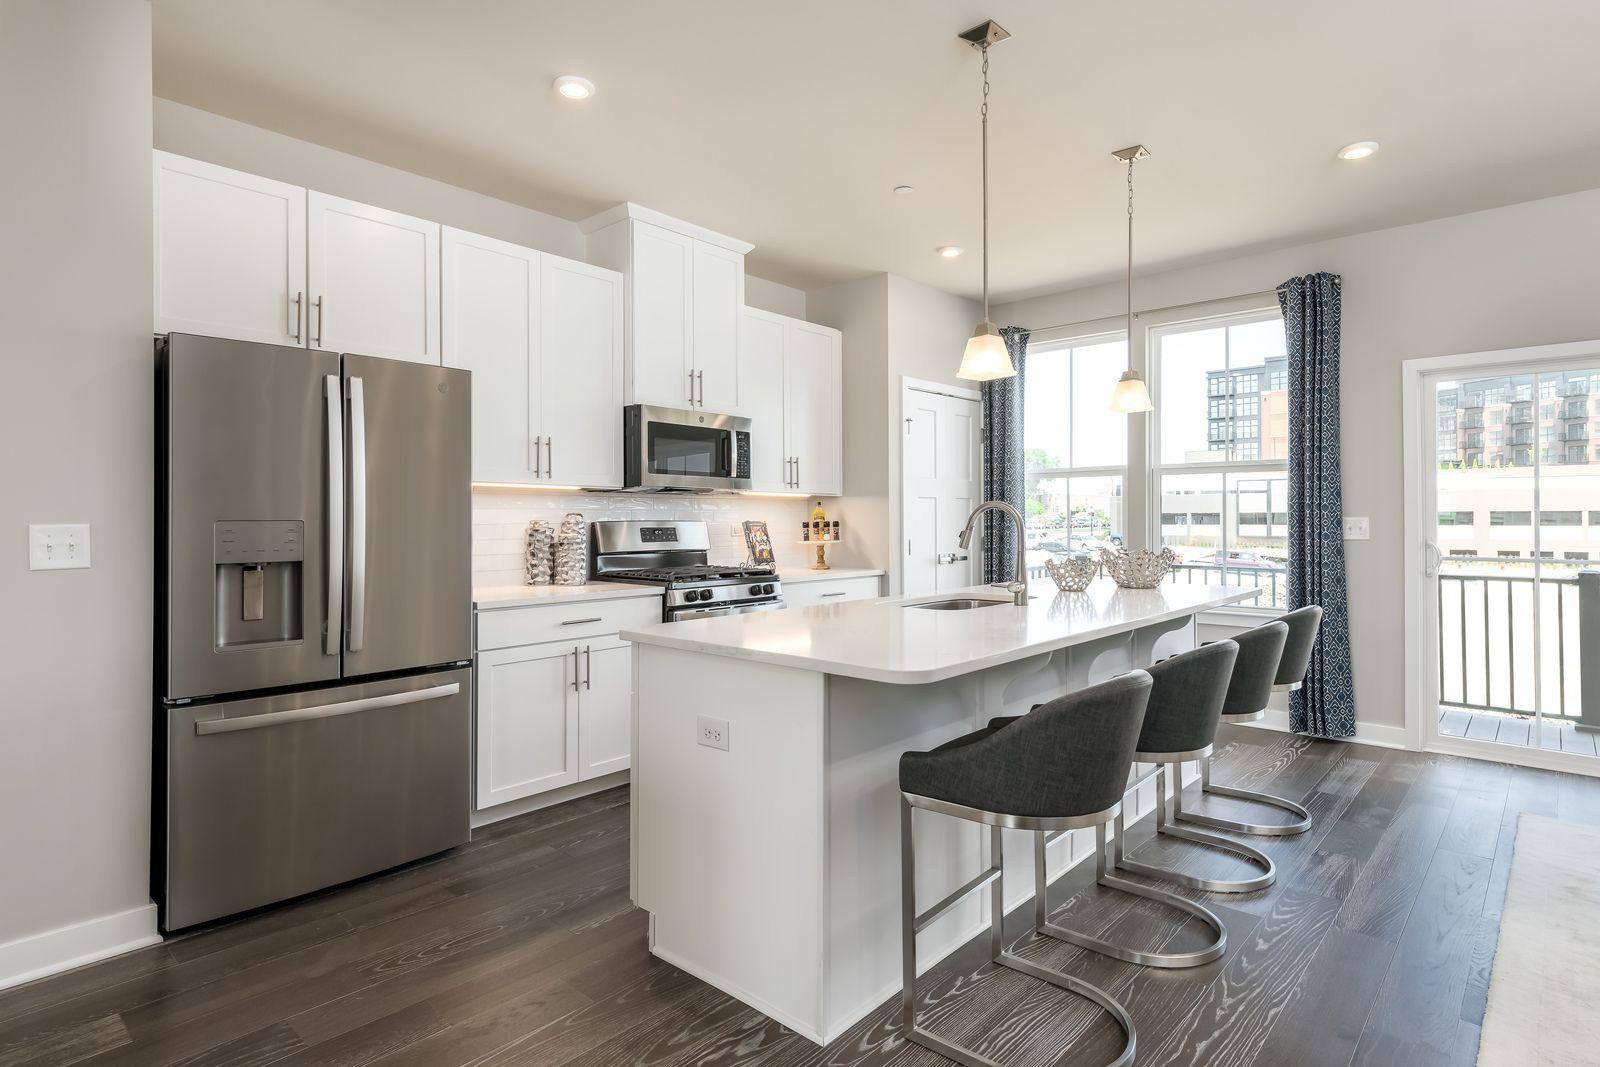 Kitchen featured in the Mendelssohn Rear Garage By Ryan Homes in Washington, MD